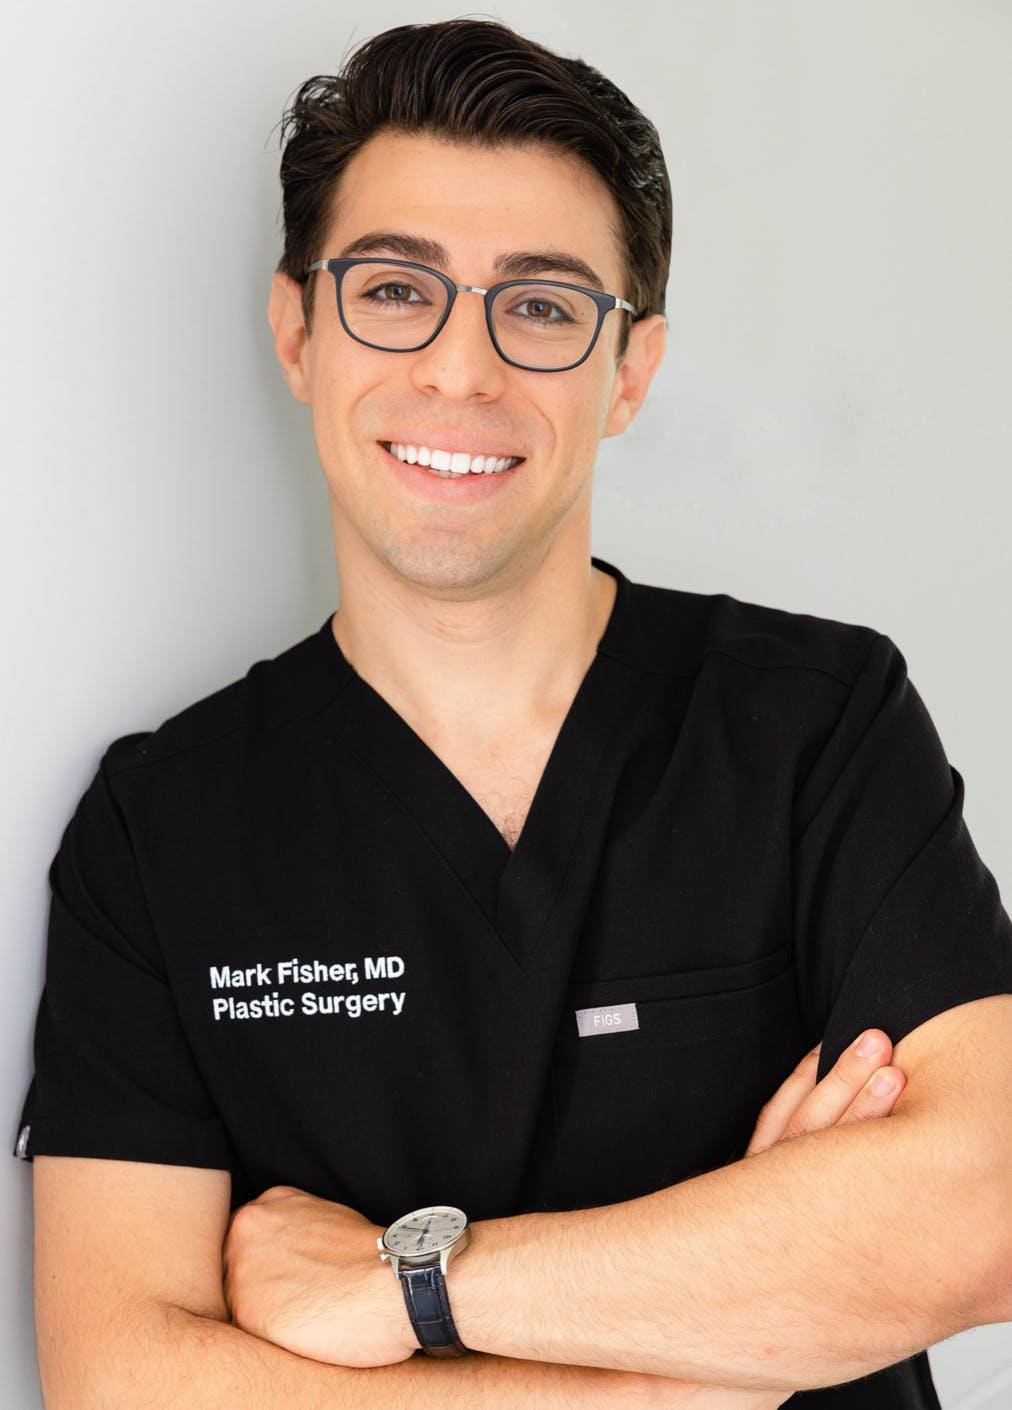 Pediatric Dr. Mark Fisher